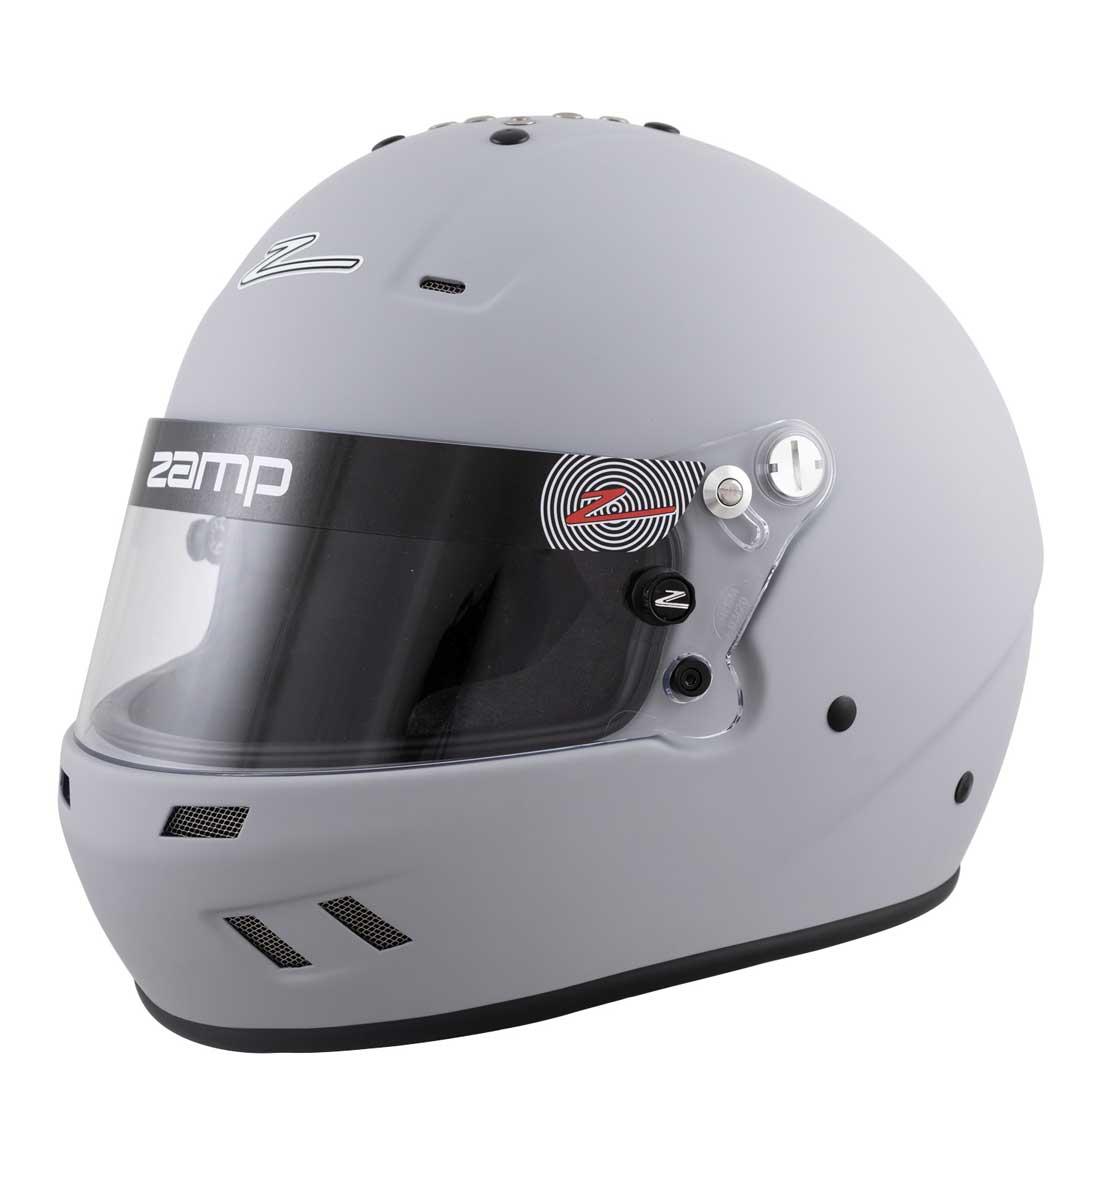 Zamp Helmet RZ 59 -  Matte Grey -  Large 60cm